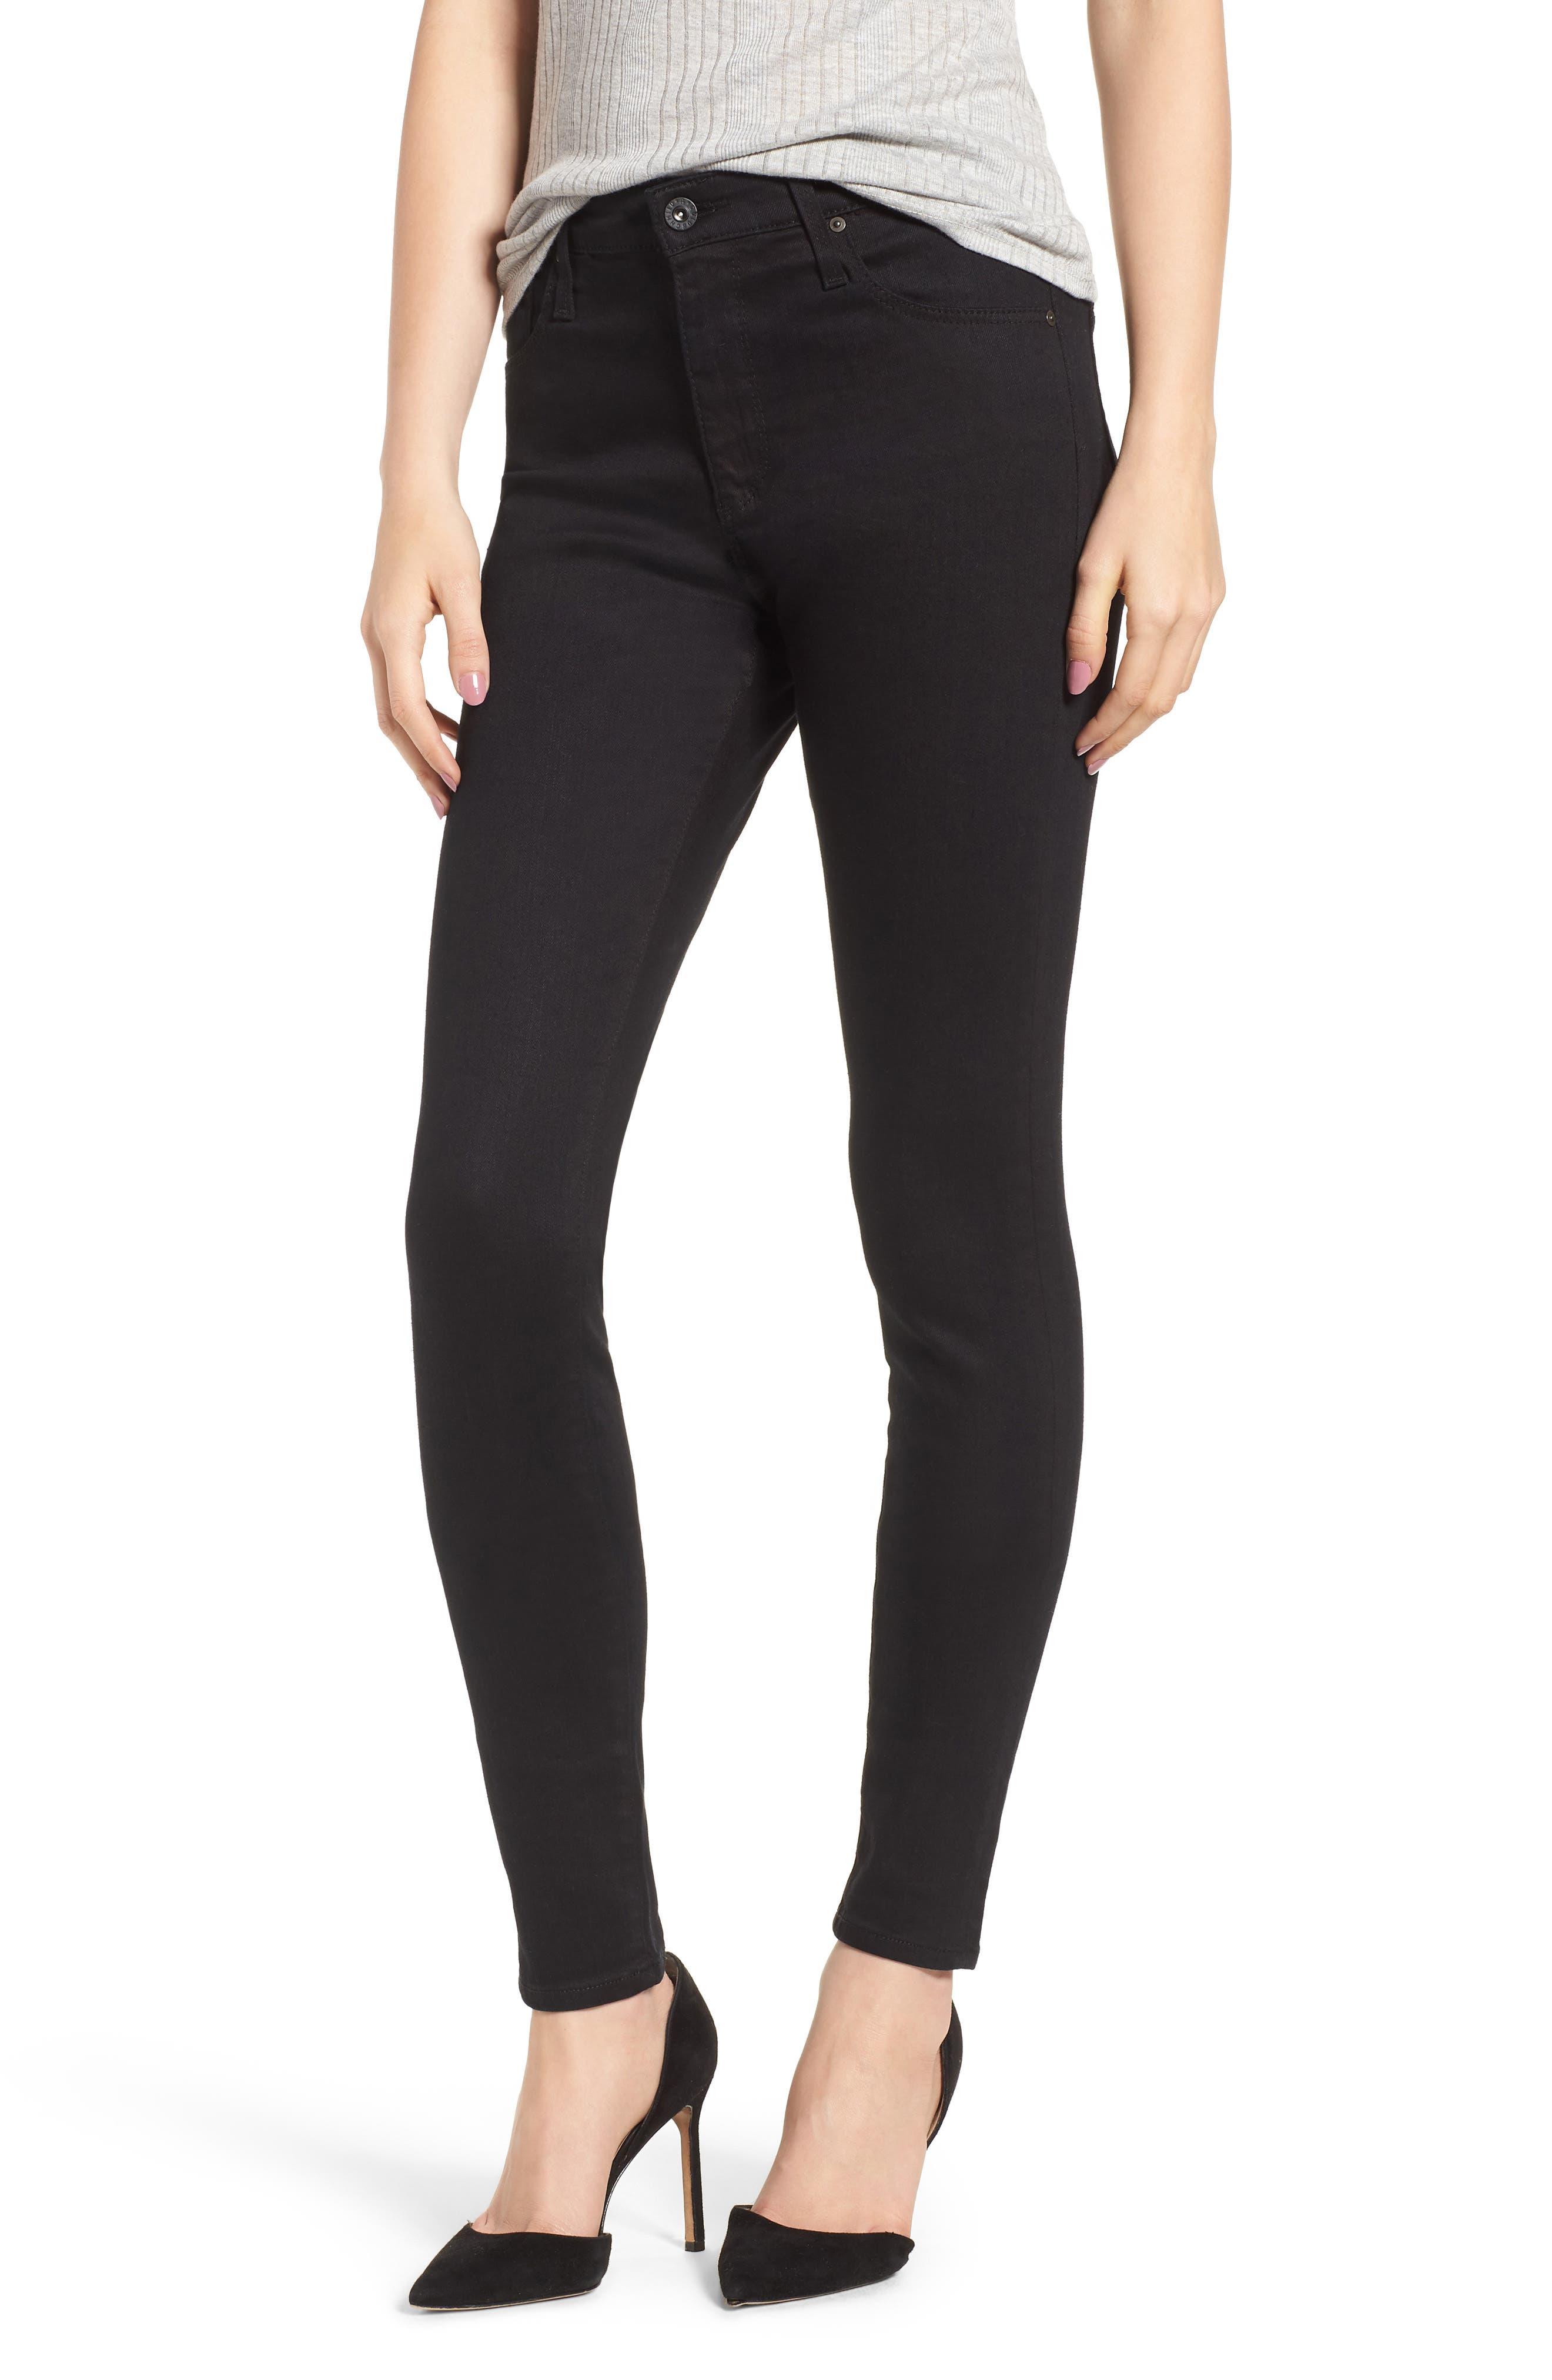 AG, 'The Farrah' High Rise Skinny Jeans, Main thumbnail 1, color, 010